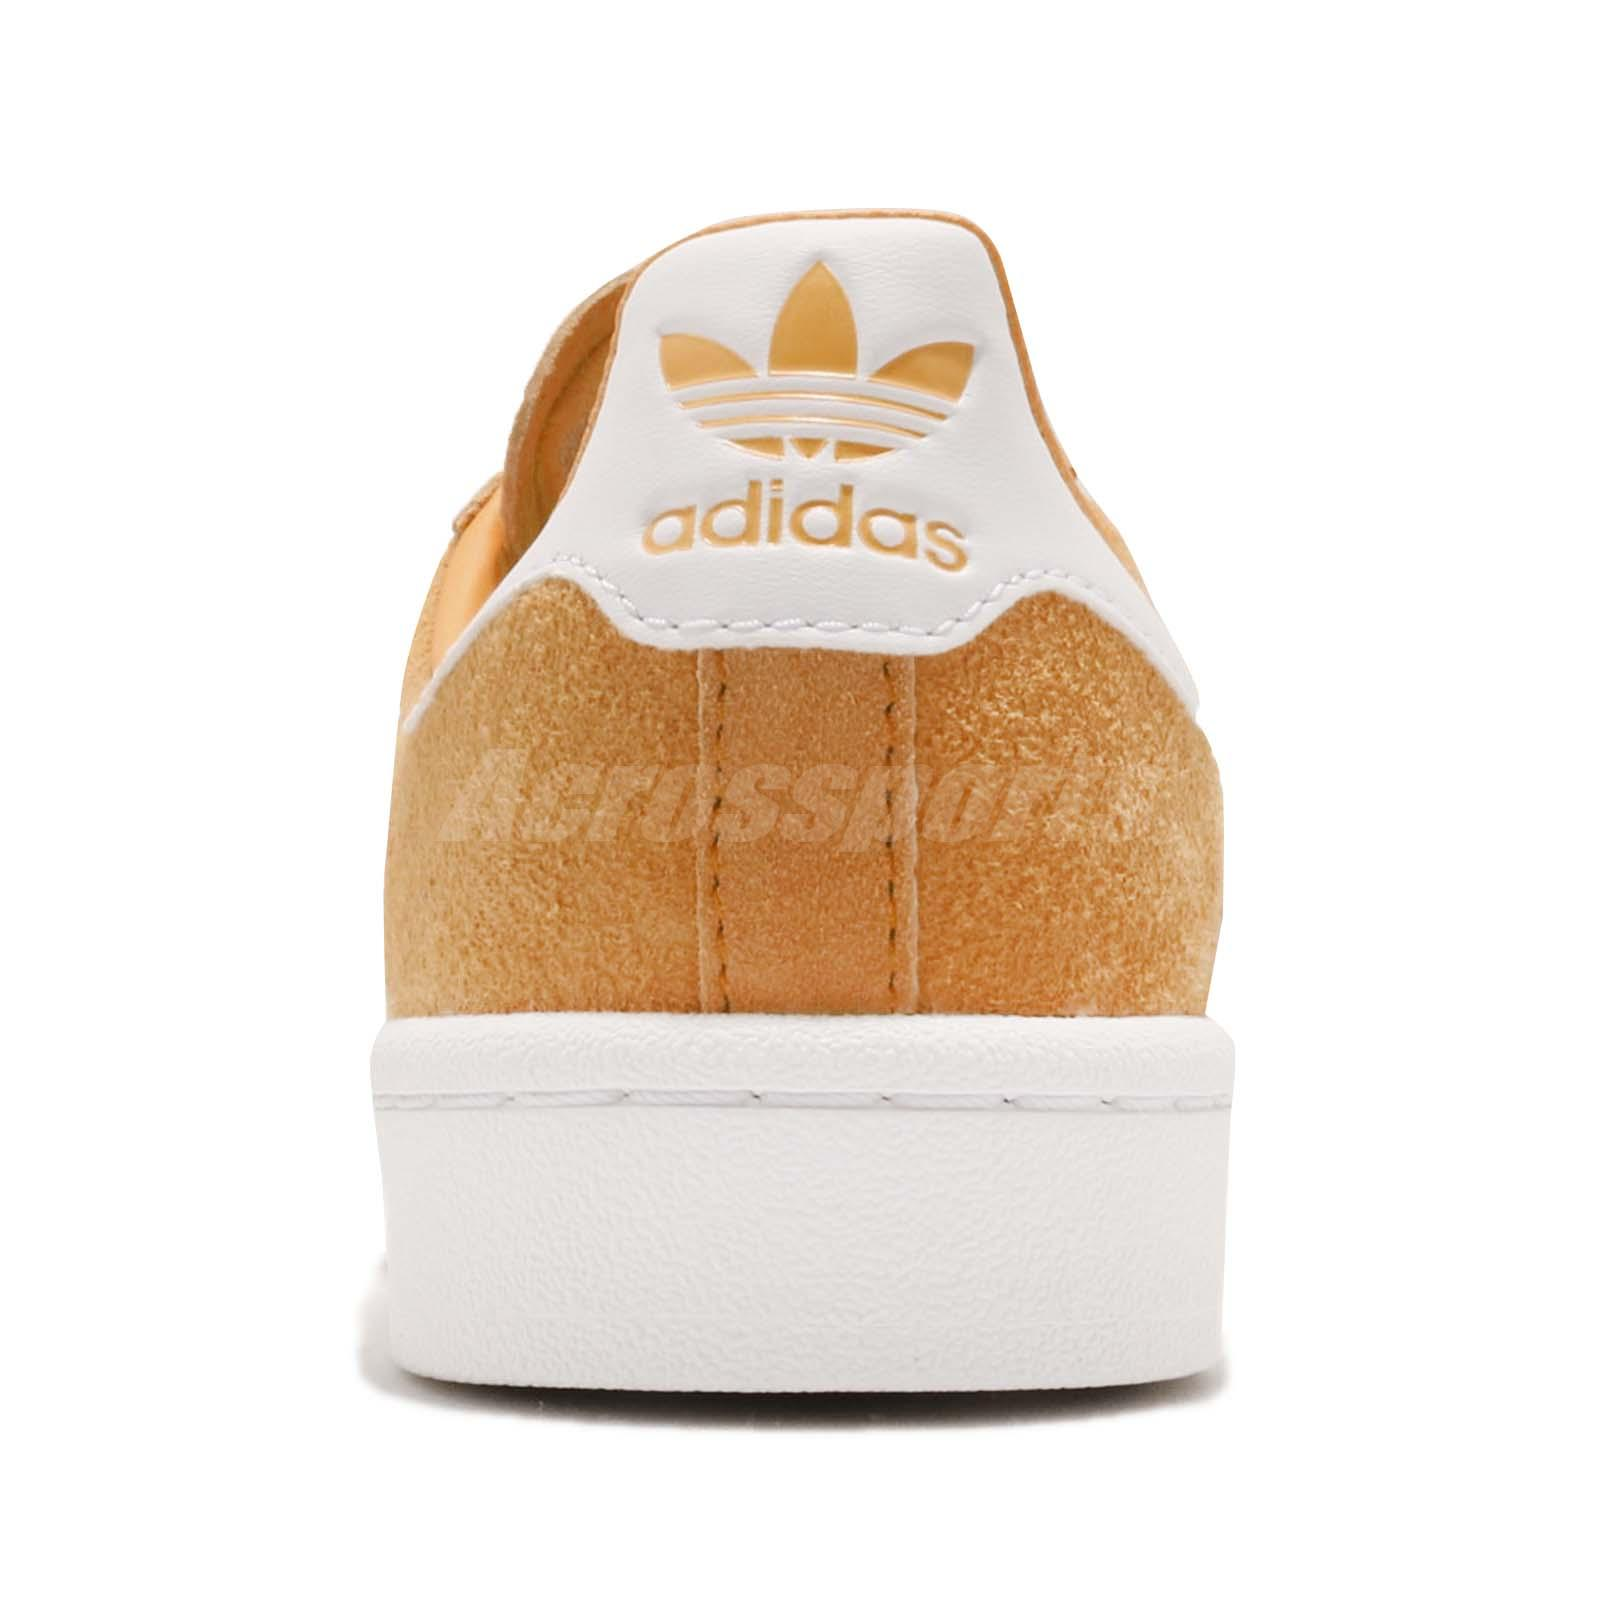 a8f3f8d6d15aa1 adidas Originals Campus W Chalk Orange White Women Casual Shoes ...